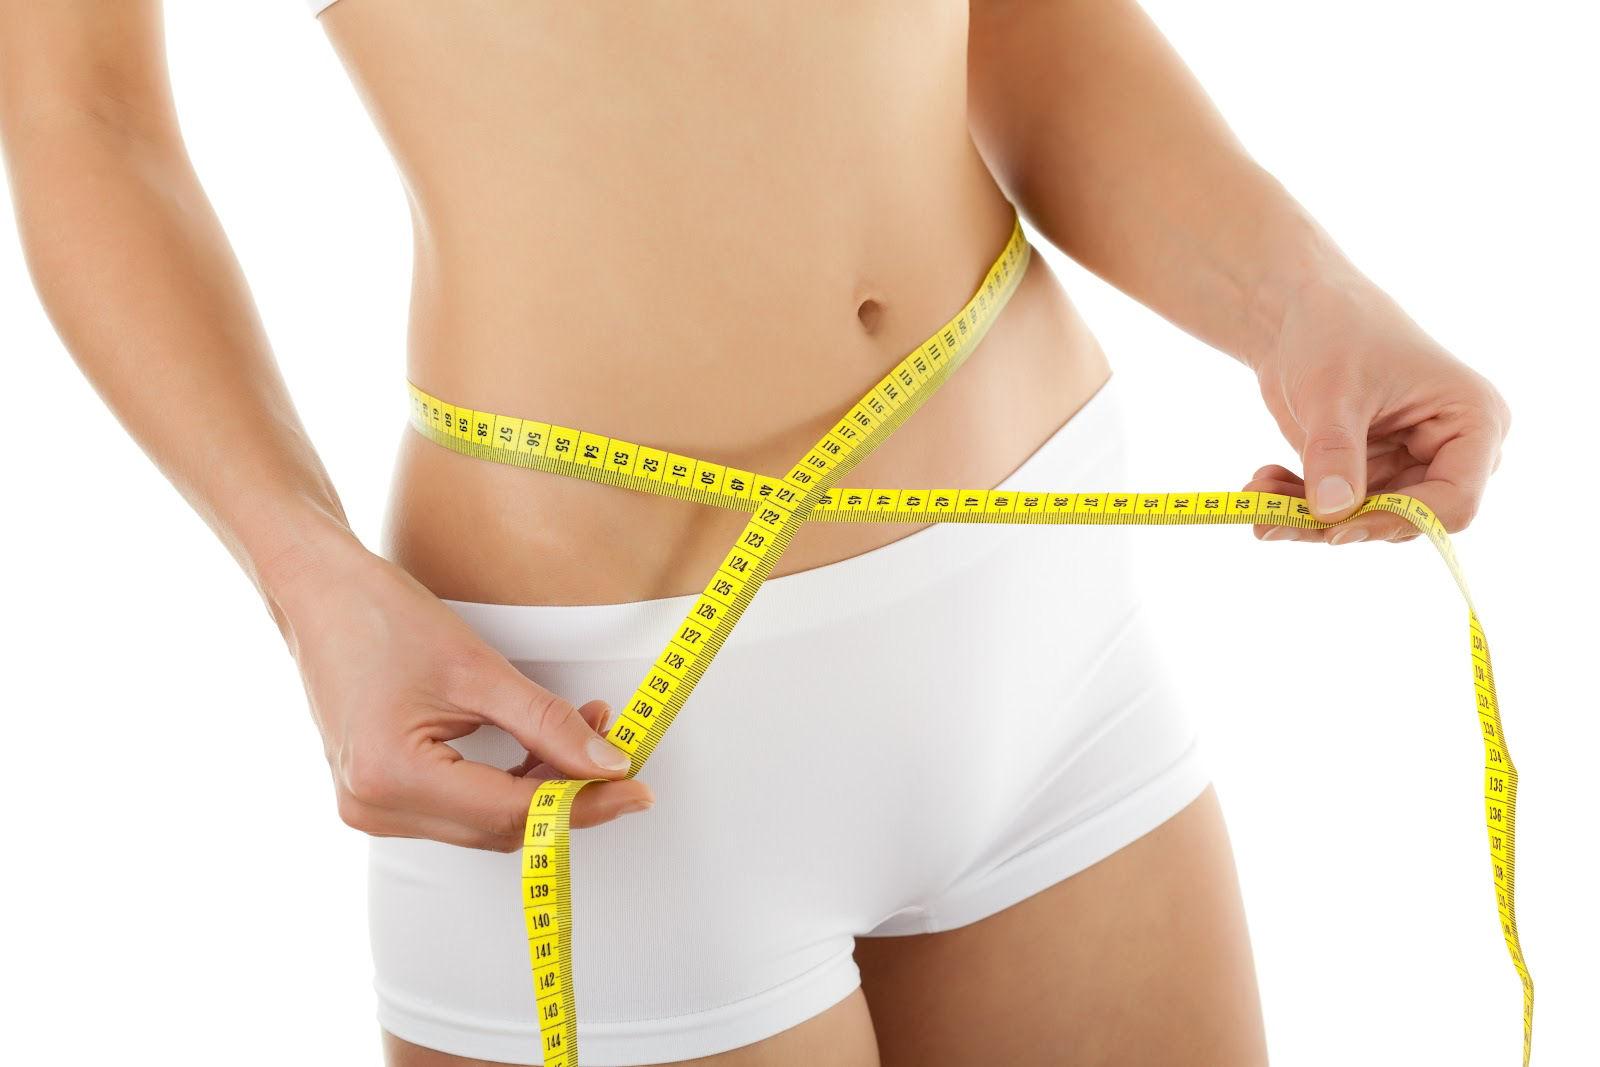 5 Super Consejos Simples Para Perder Peso